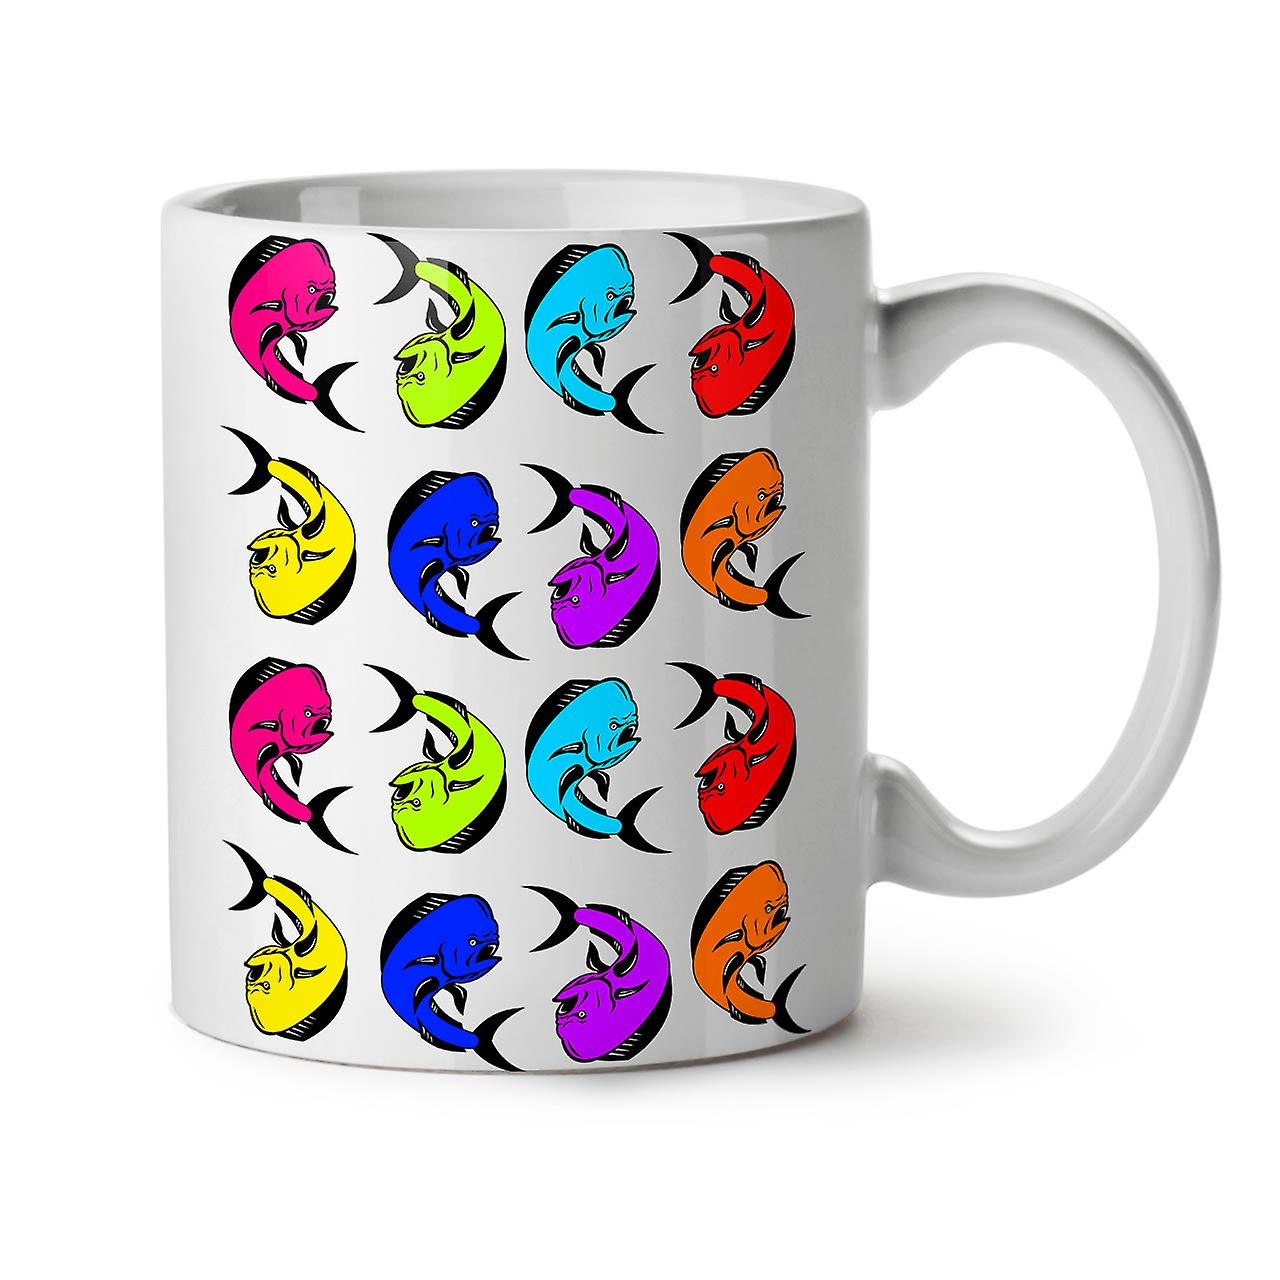 77940224 Mønster fisk kule dyr ny hvit te kaffe keramiske krus 11 oz   Wellcoda